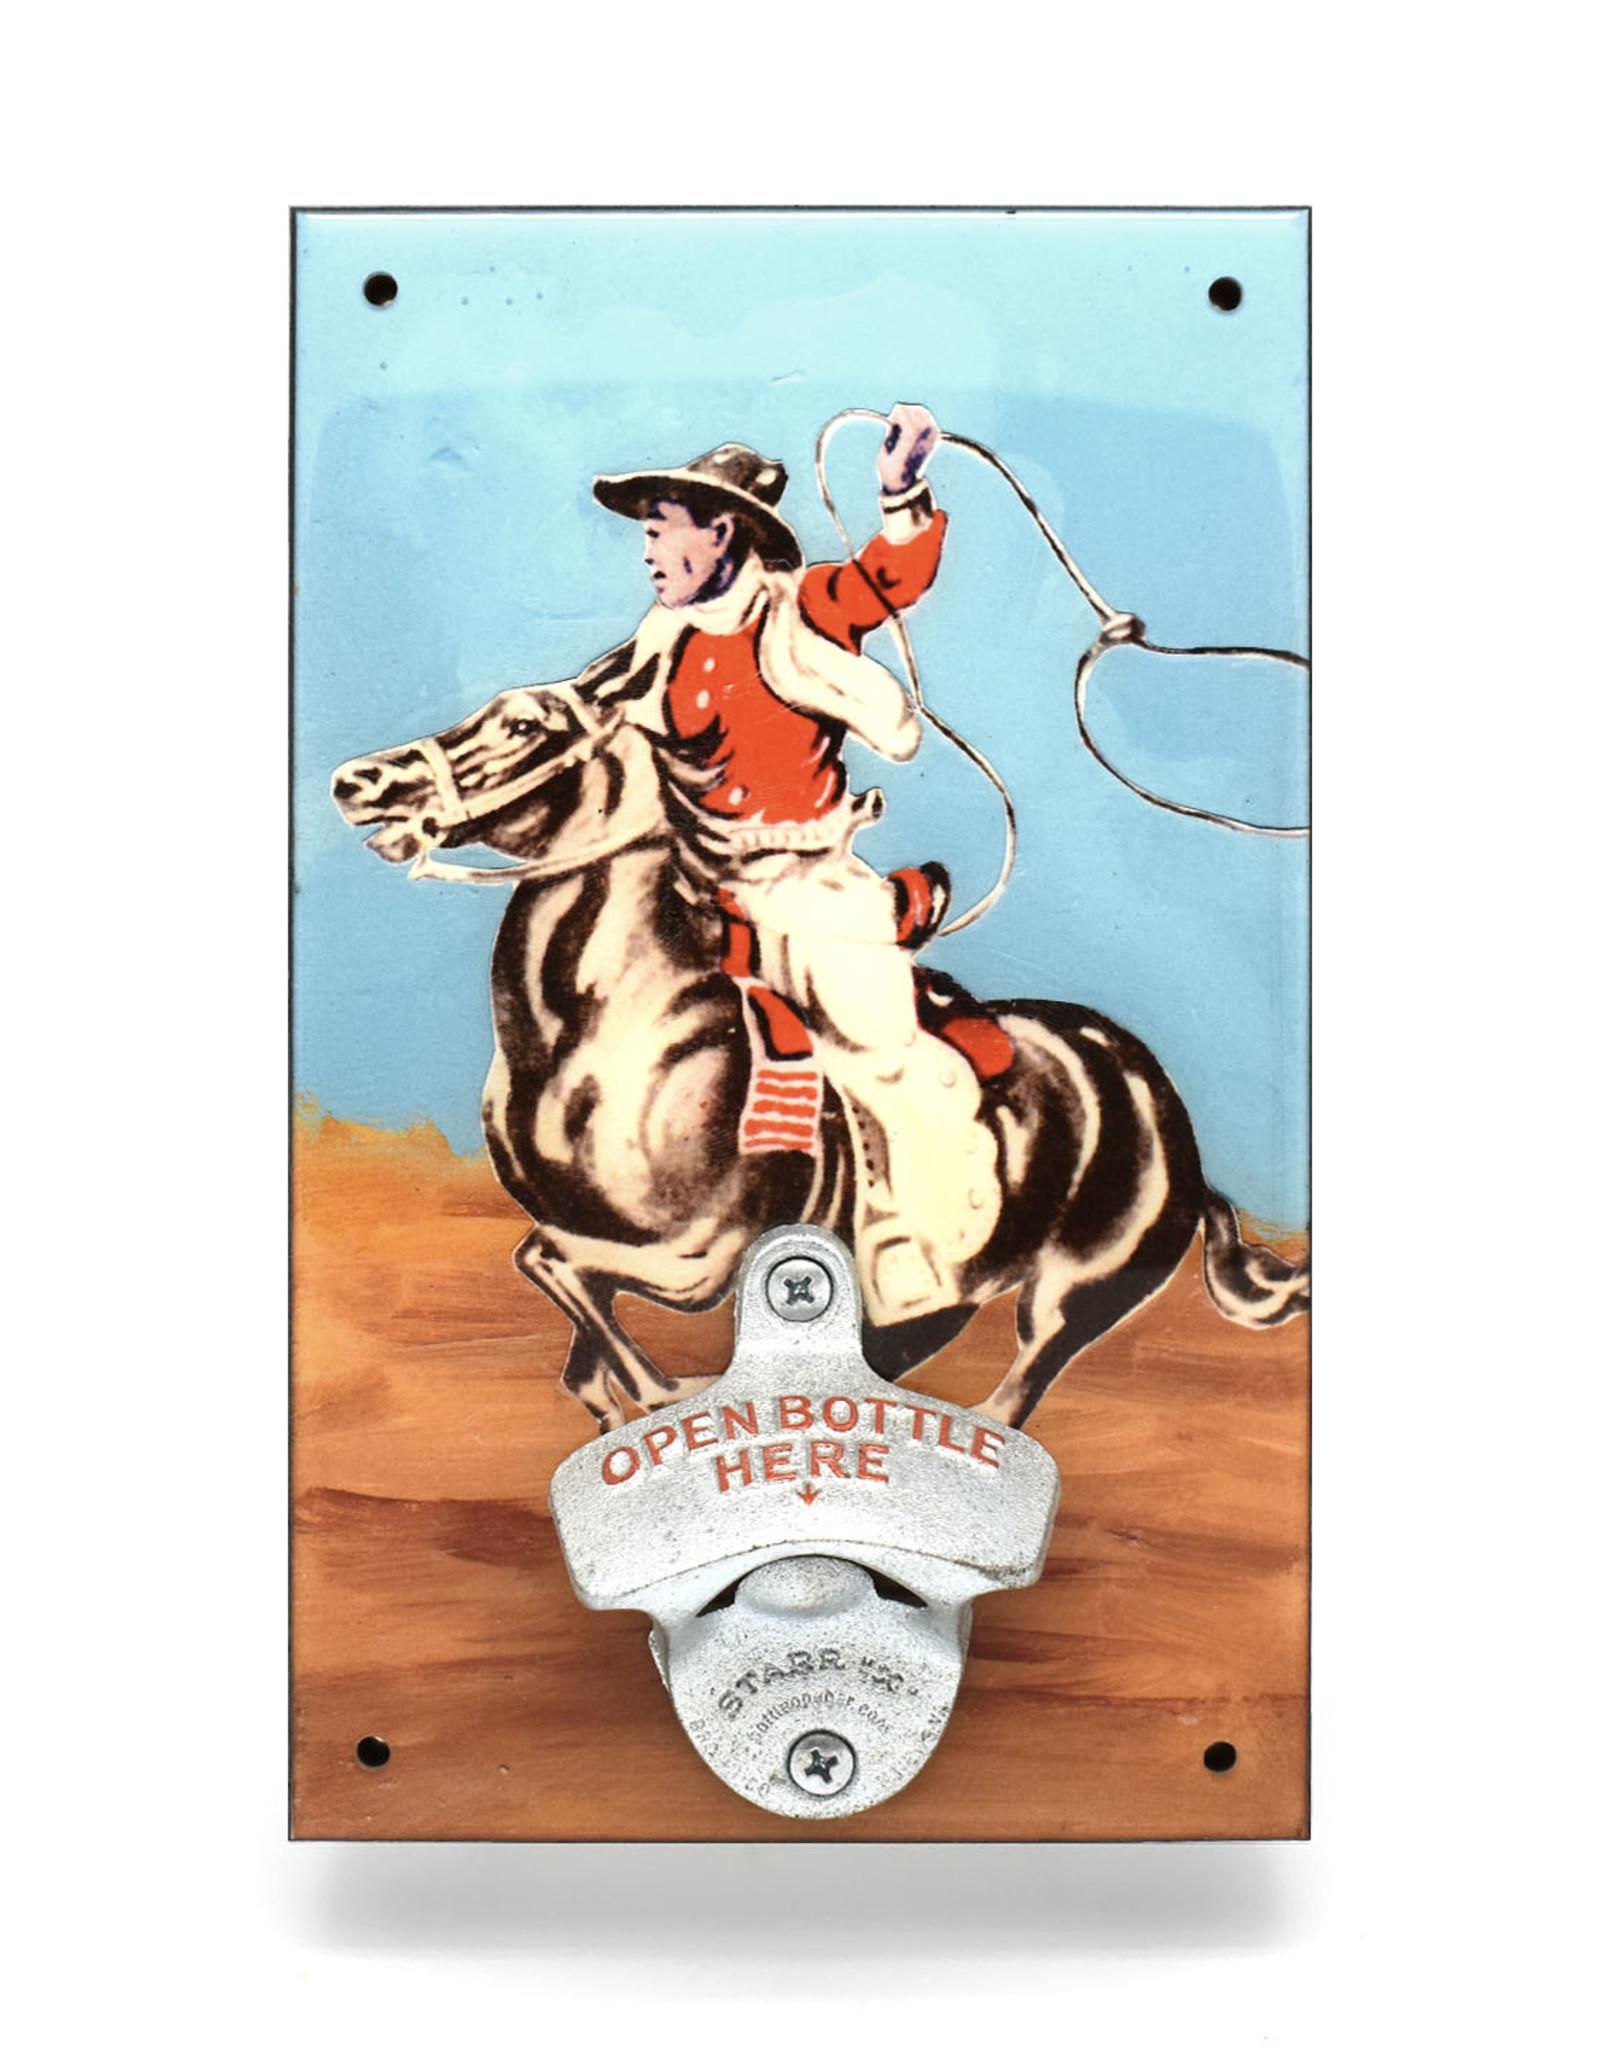 Cowboy Bottle Opener